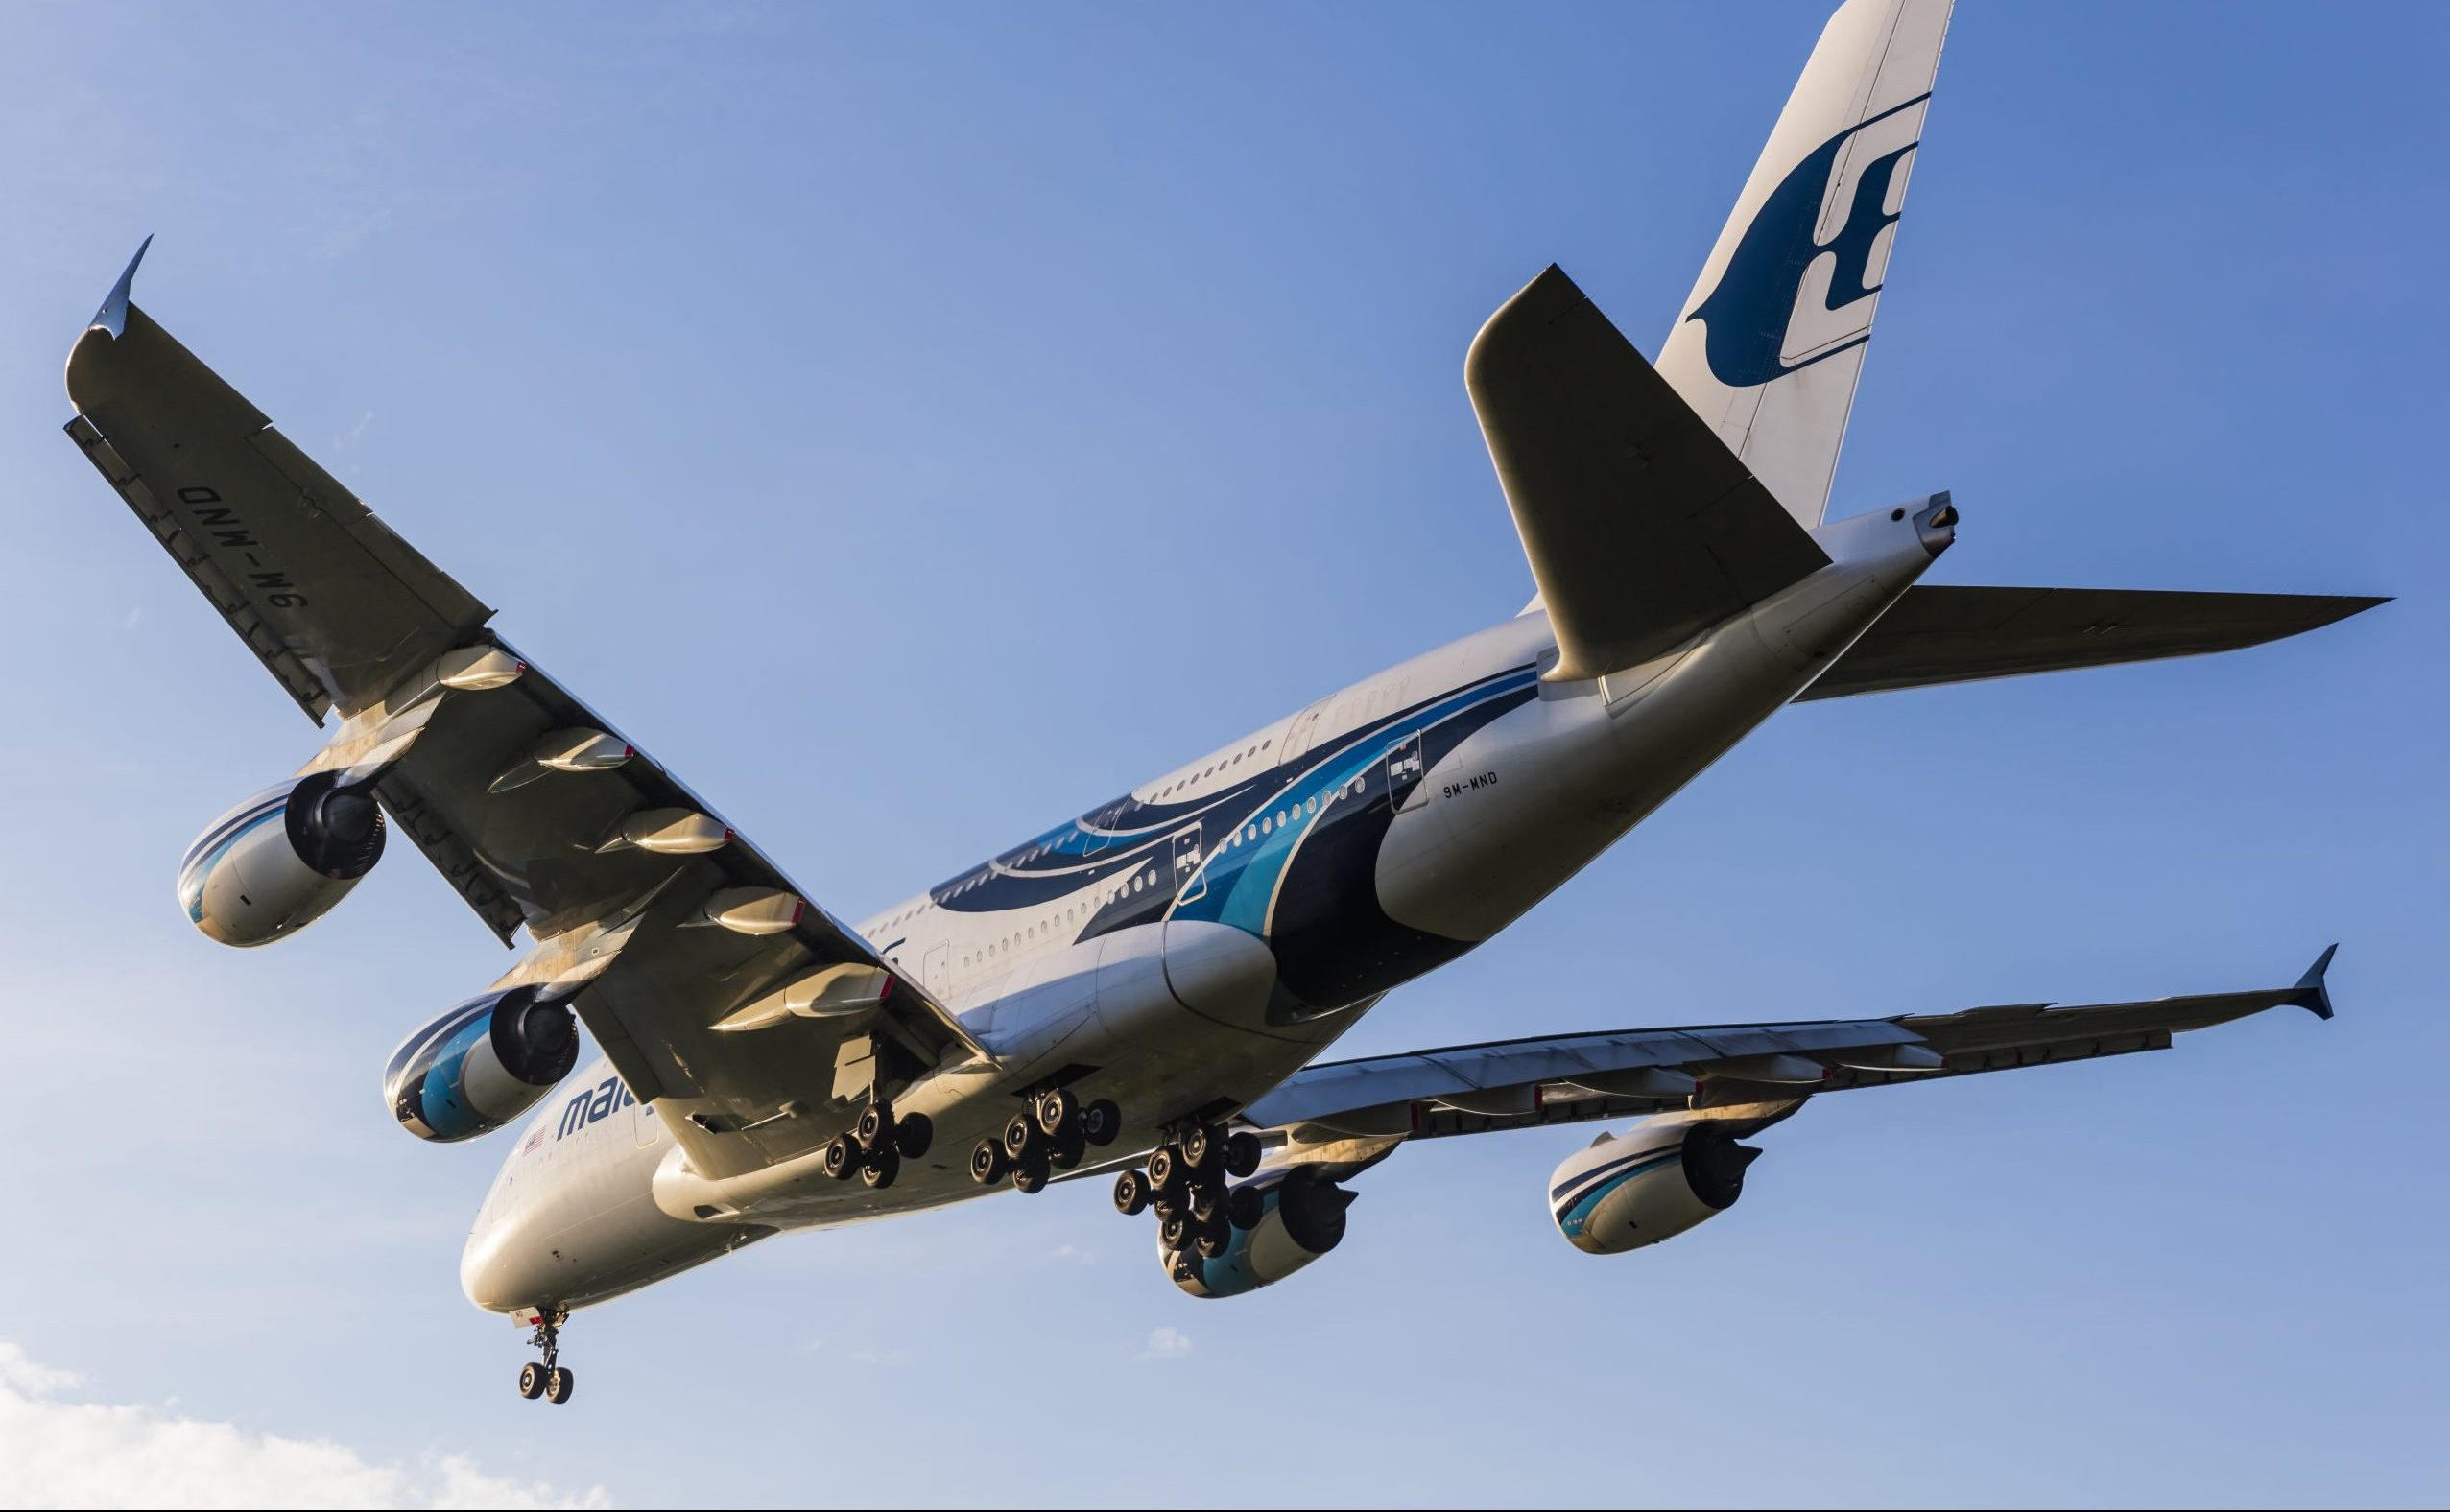 En Airbus A380-800 fra Malaysia Airlines. Foto: © Thorbjørn Brunander Sund, Danish Aviation Photo